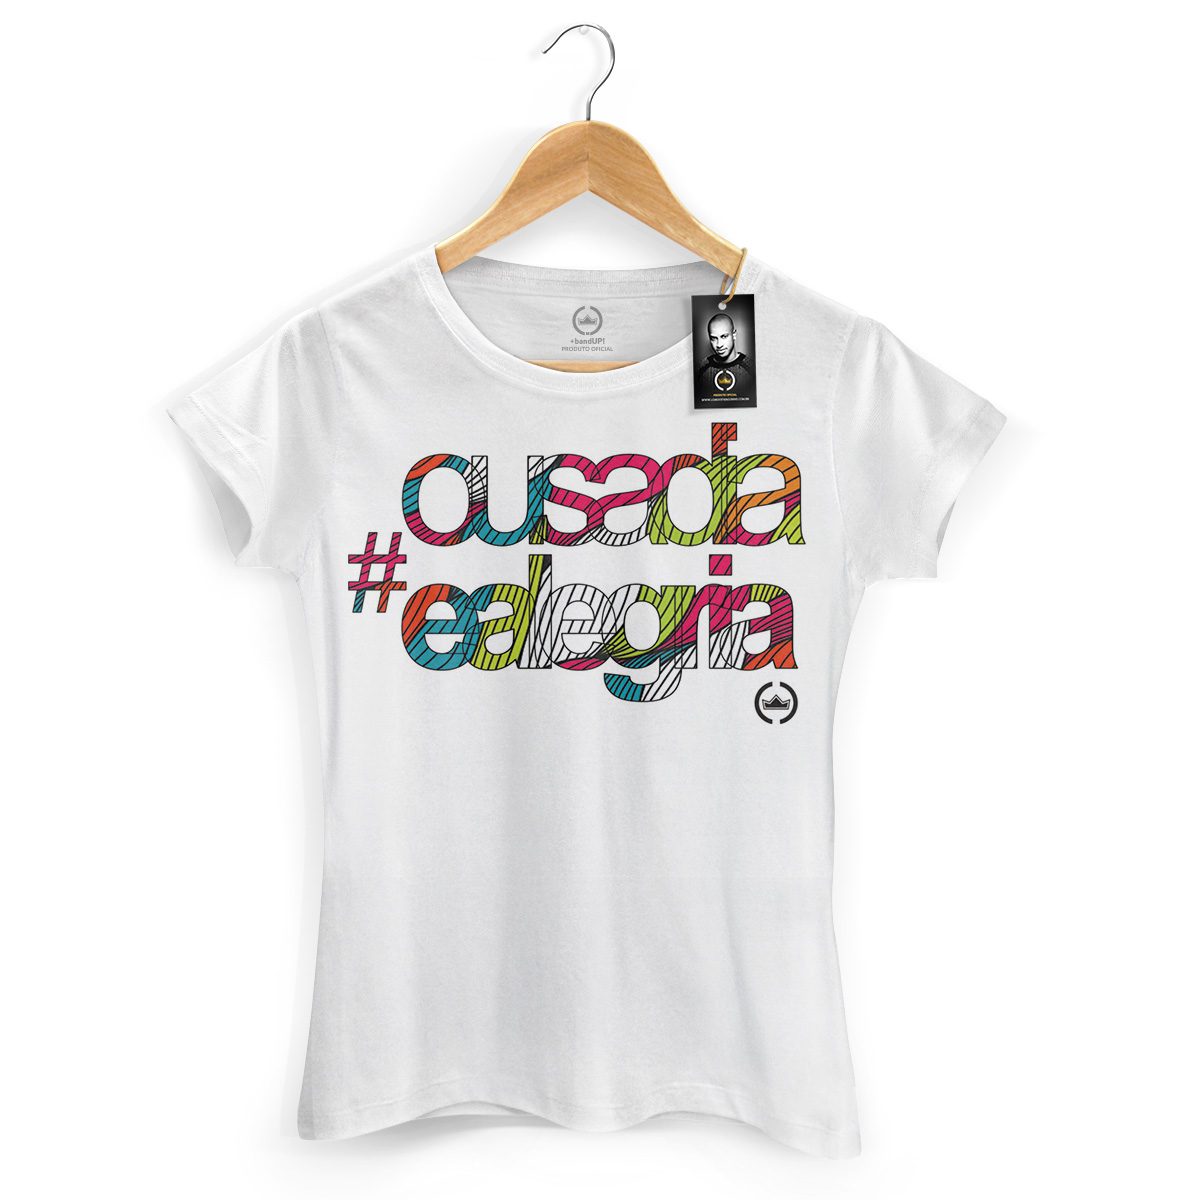 Camiseta Feminina Thiaguinho Ousadia e Alegria Colors